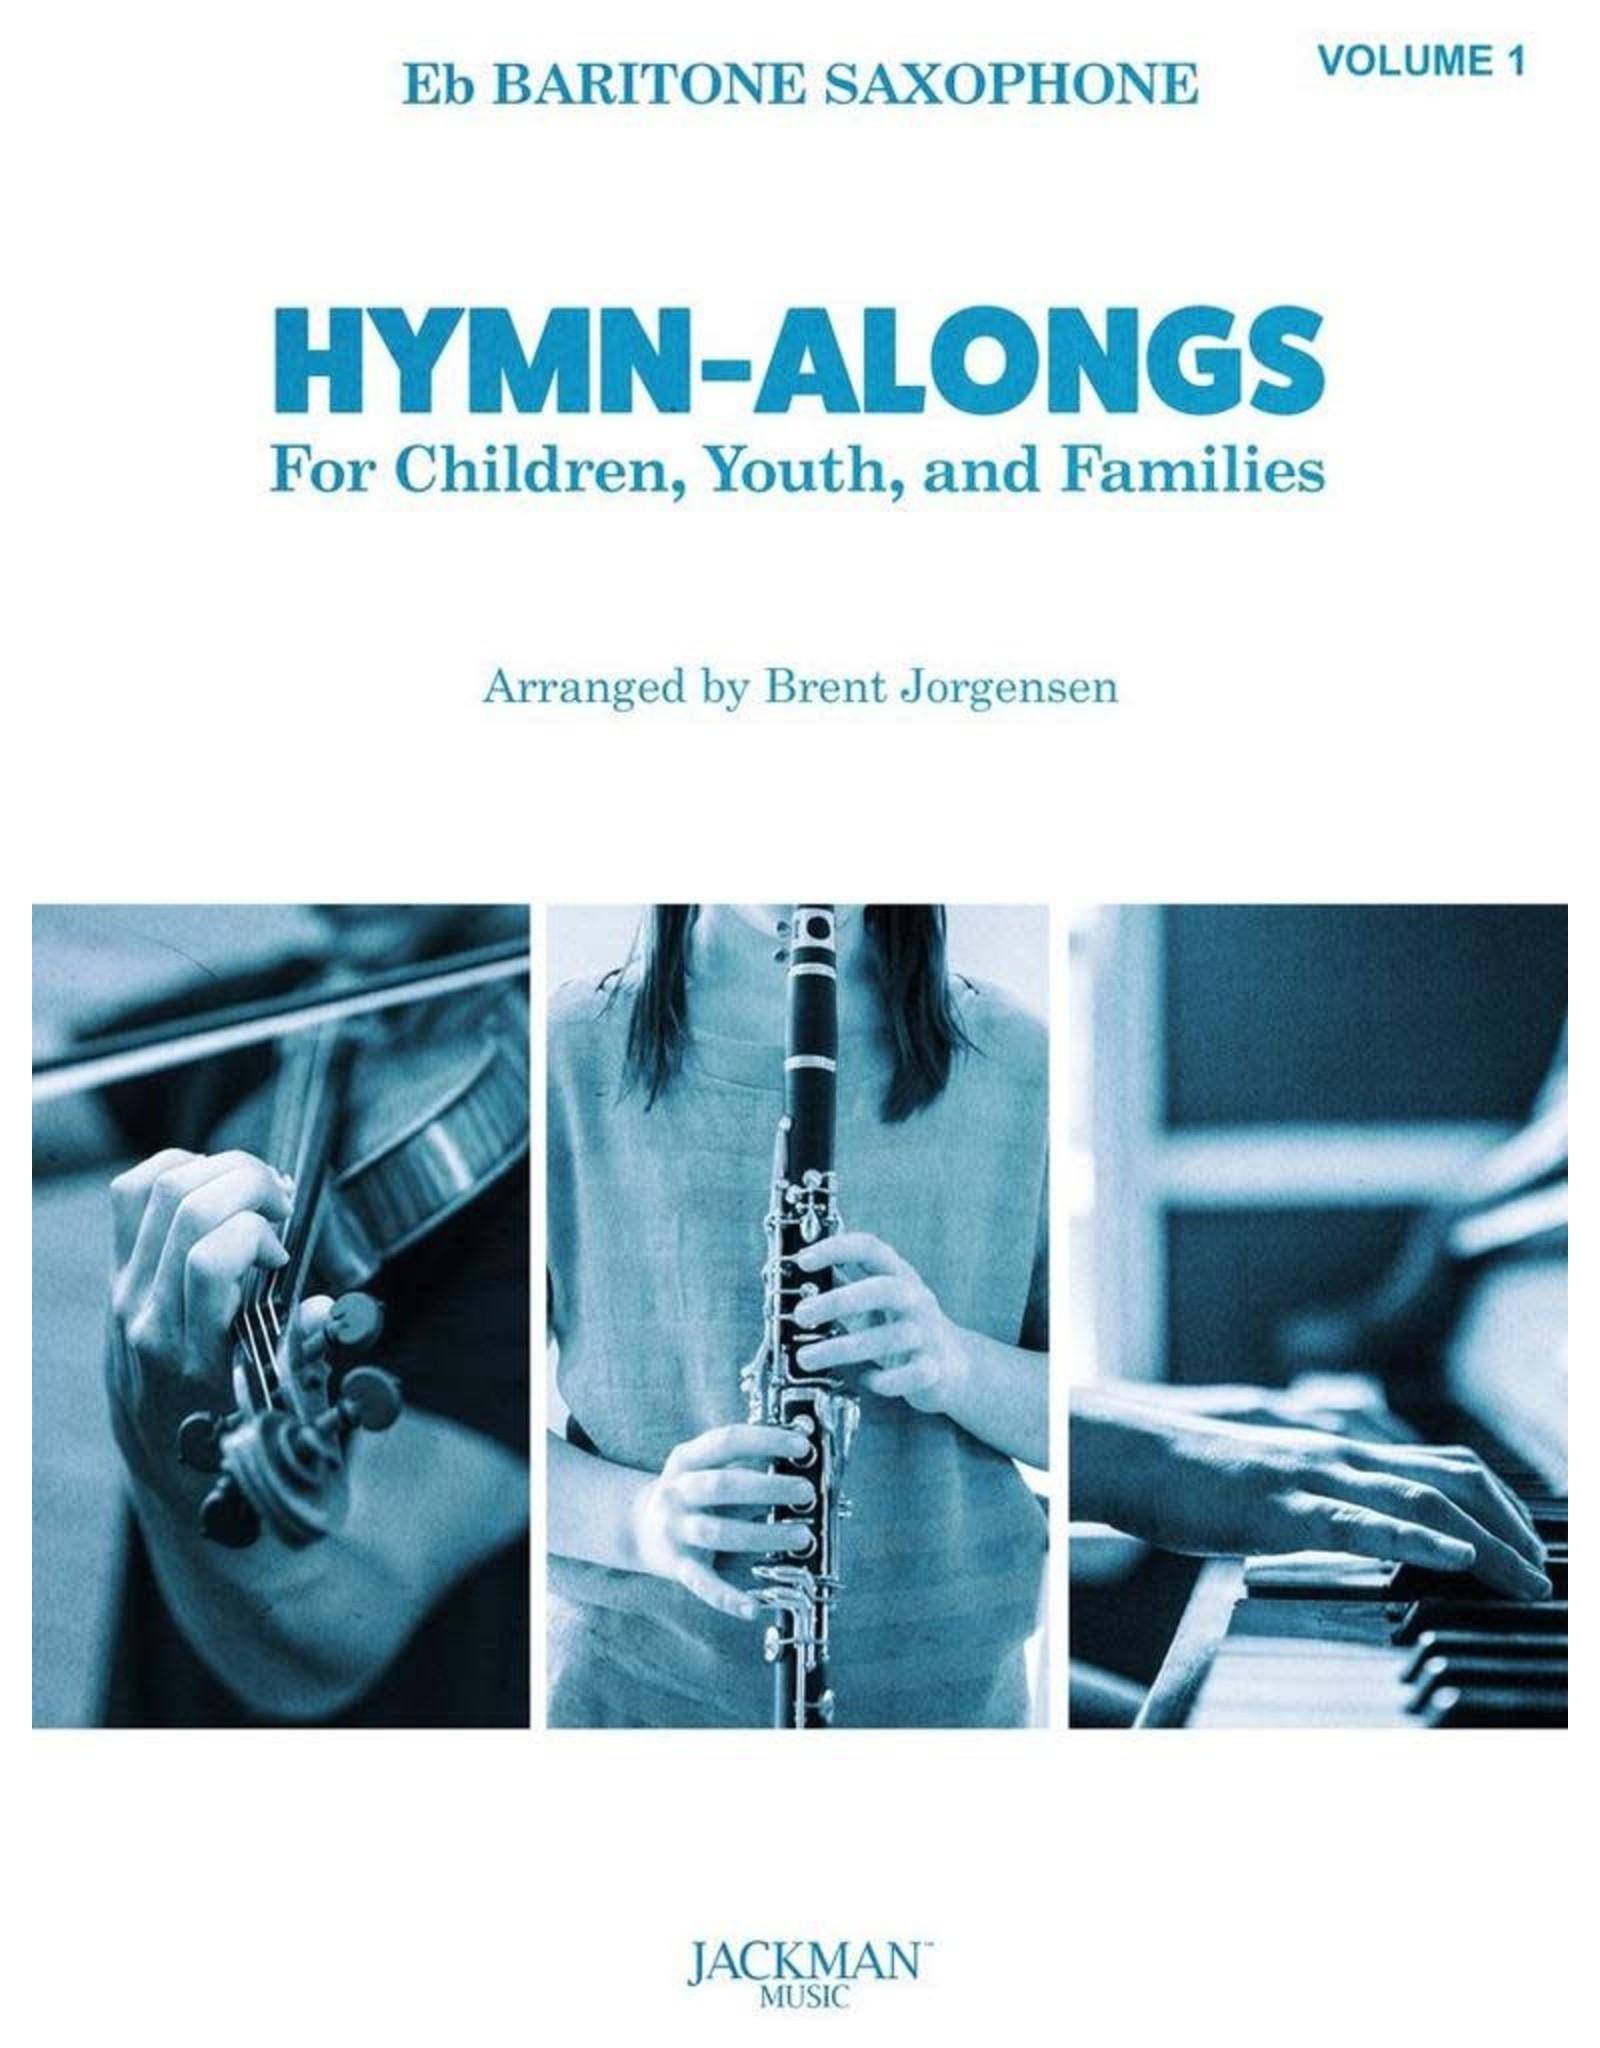 Jackman Music Hymn-Alongs Vol. 1 - arr. Brent Jorgensen - Baritone Saxophone